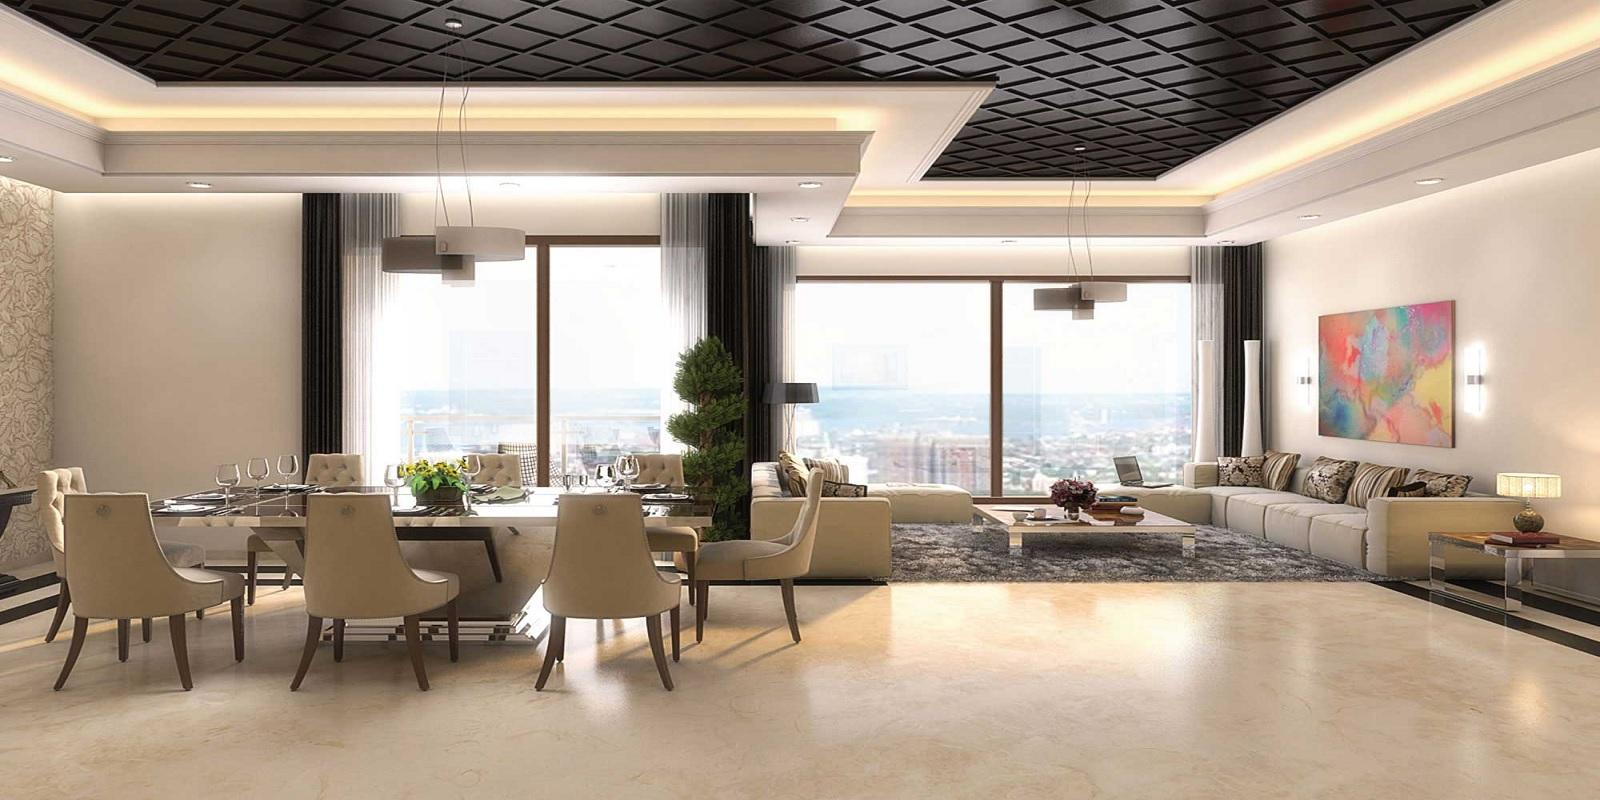 marathon emblem apartment interiors8